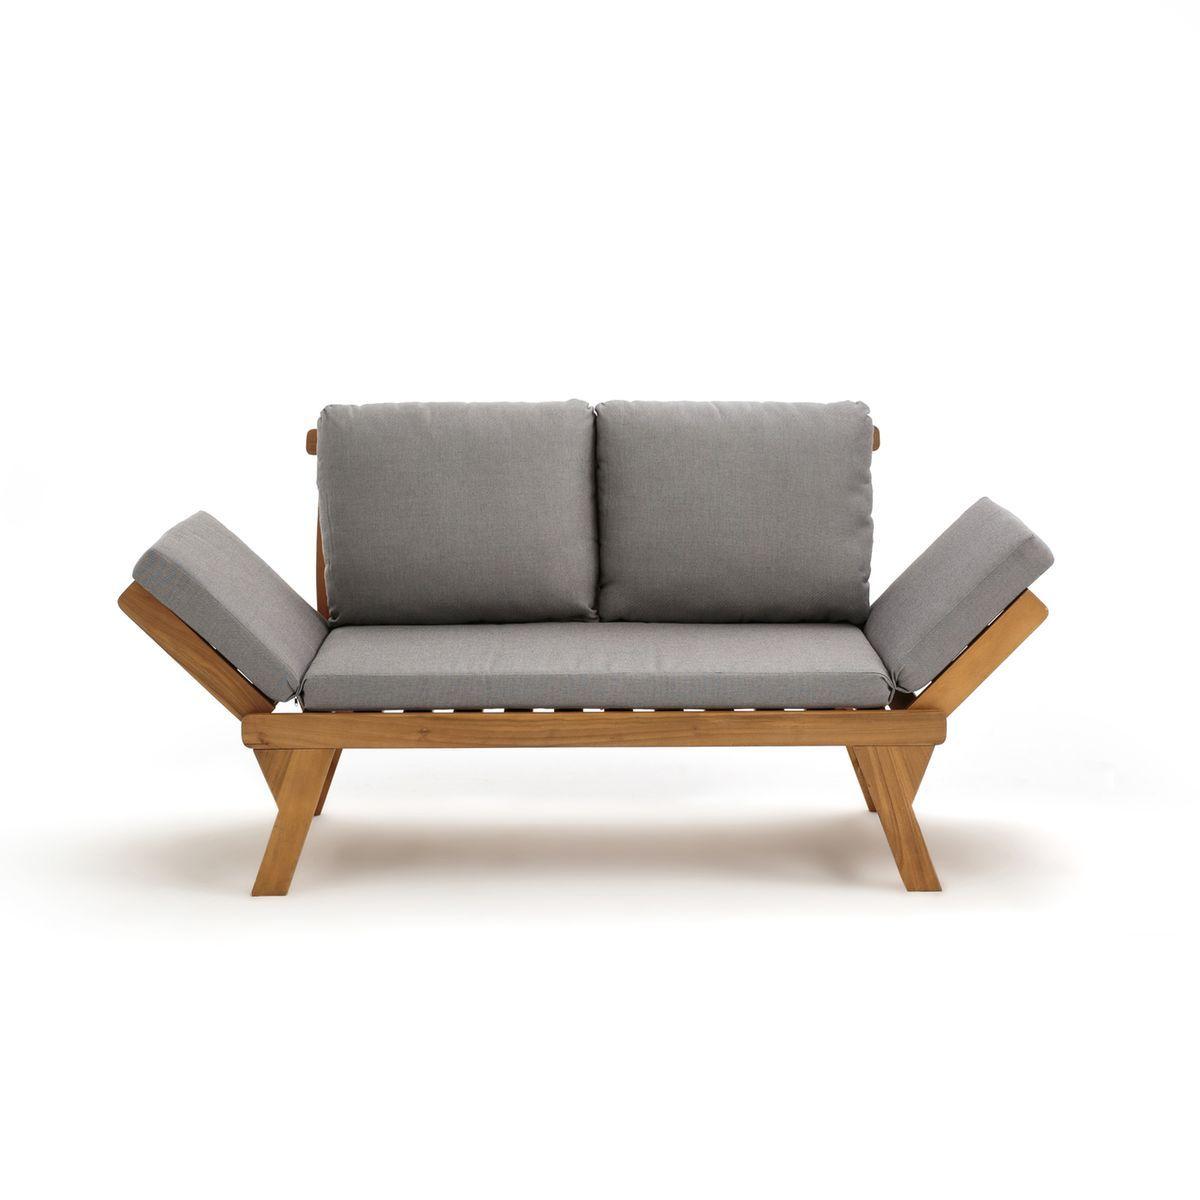 Canape De Jardin Modulable Celena Taille Taille Unique